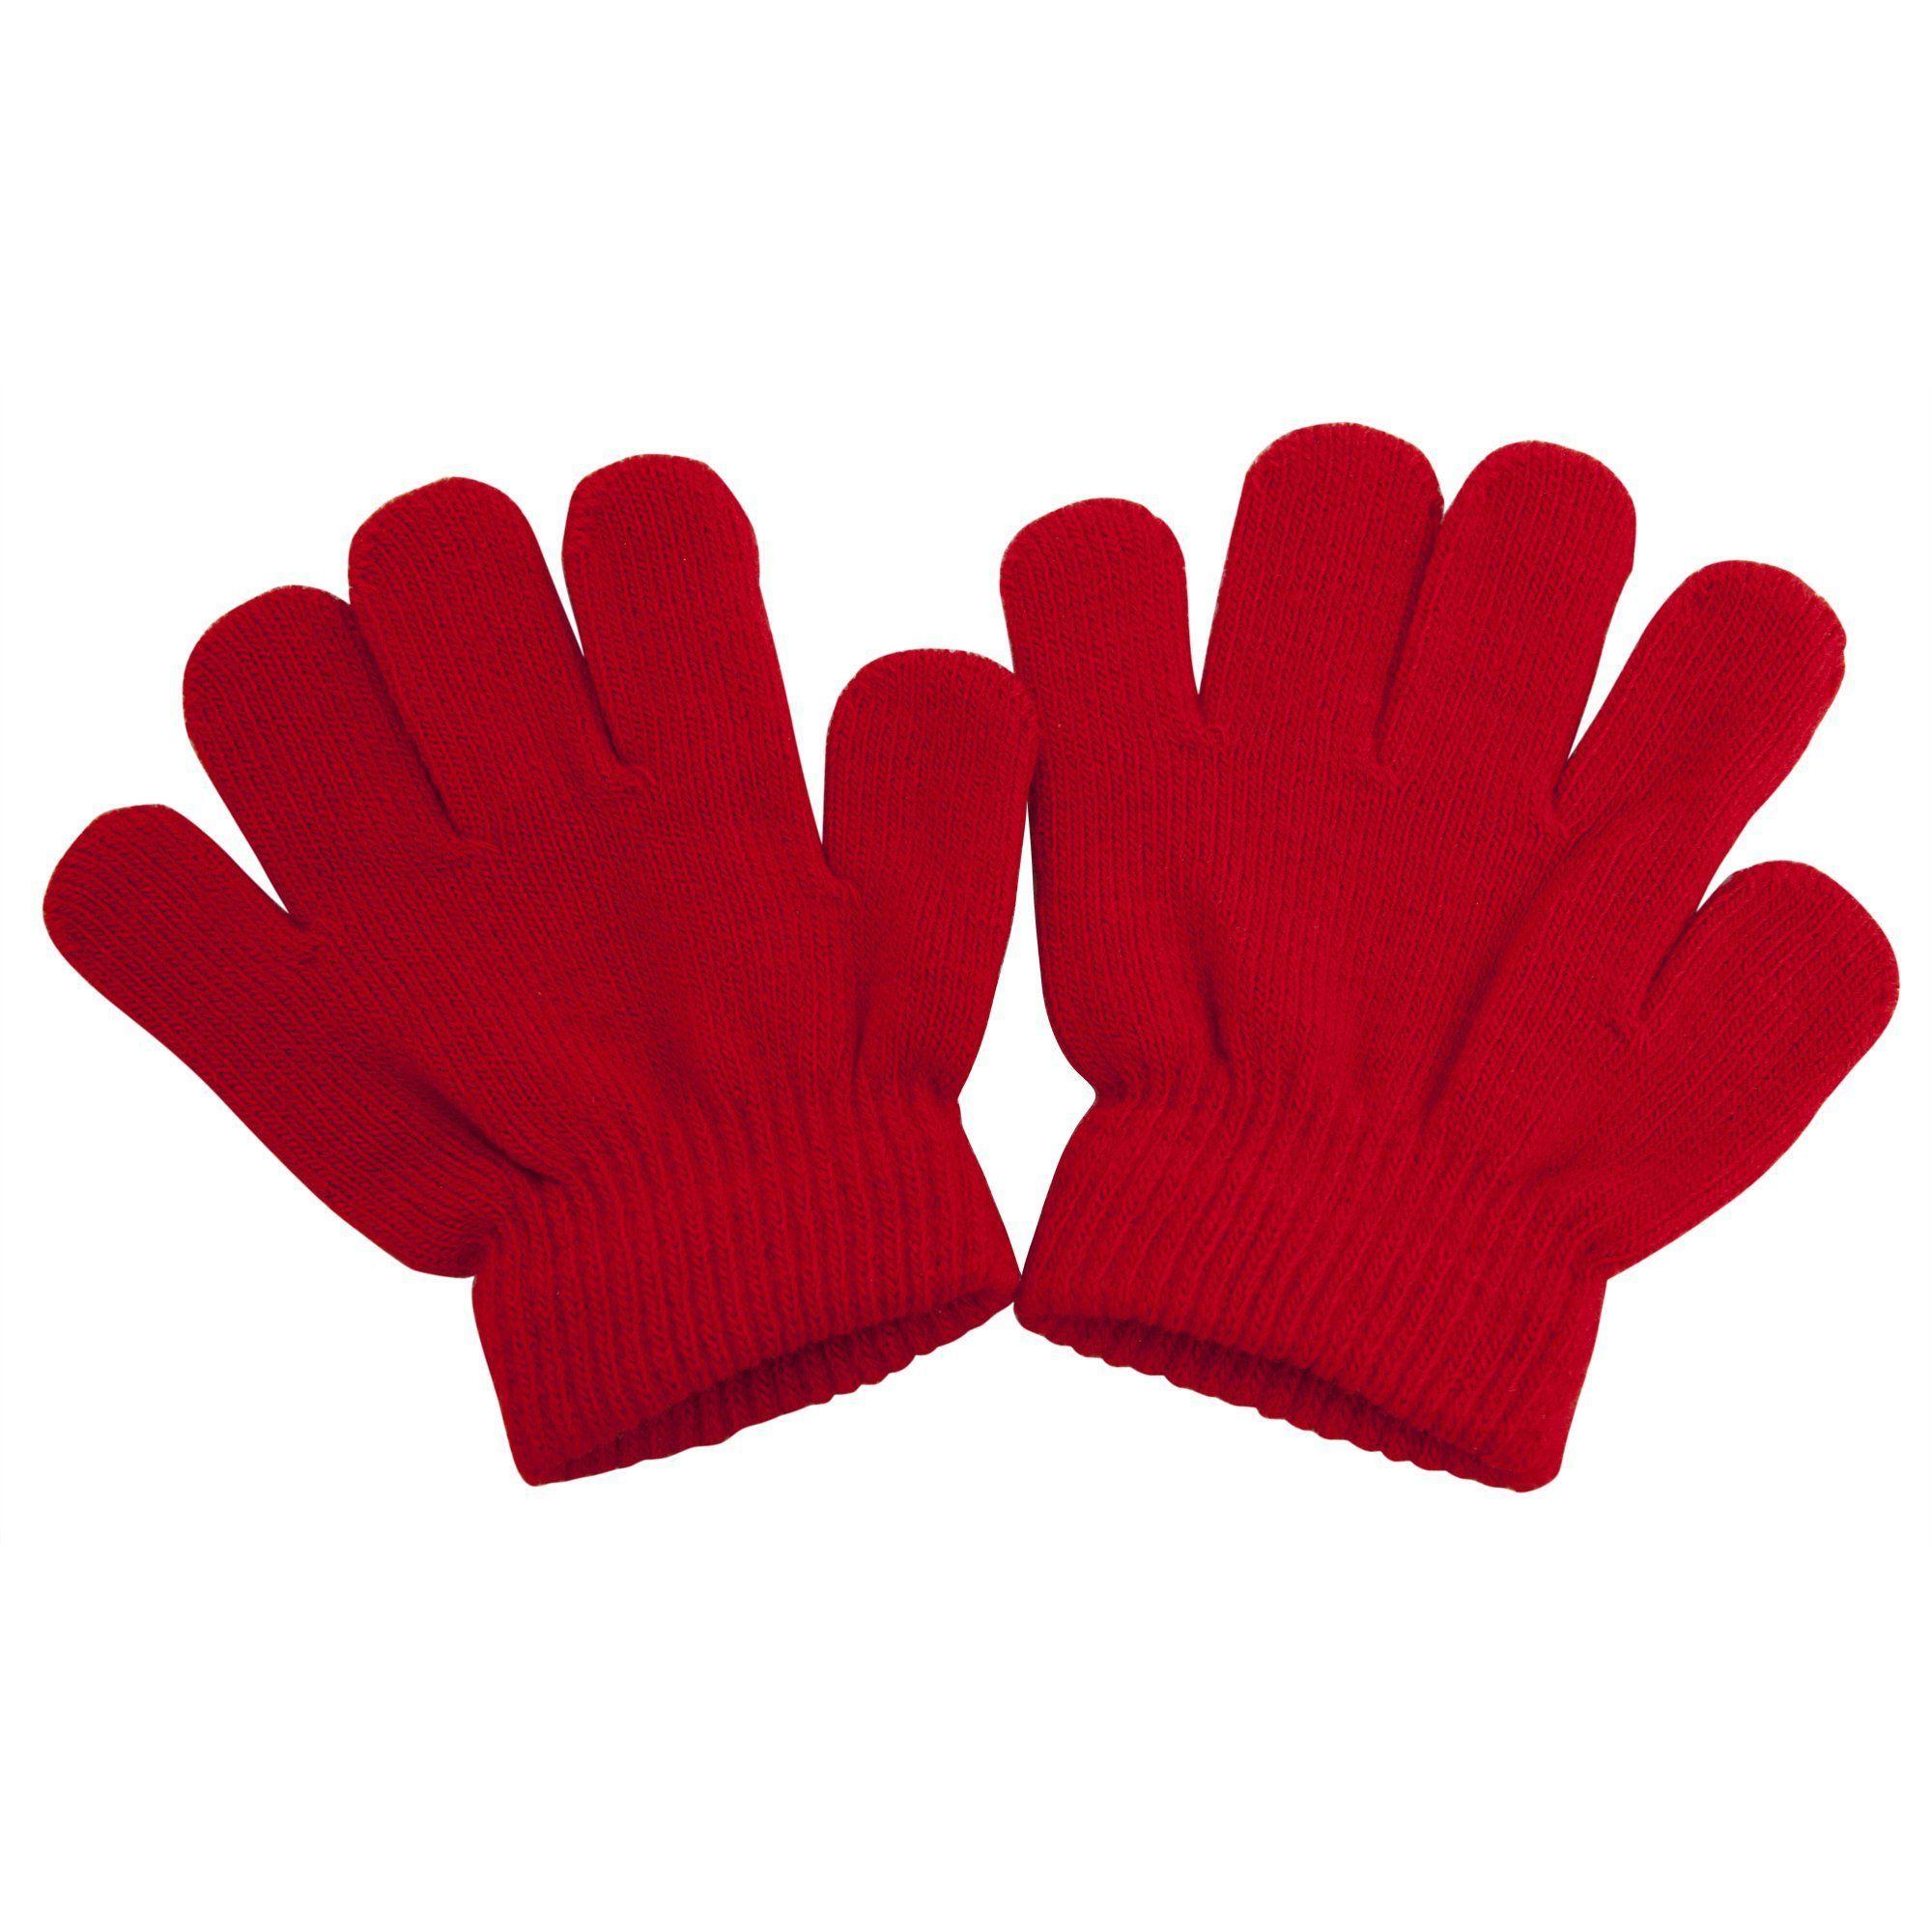 #Kids #Winter Magic #Gloves